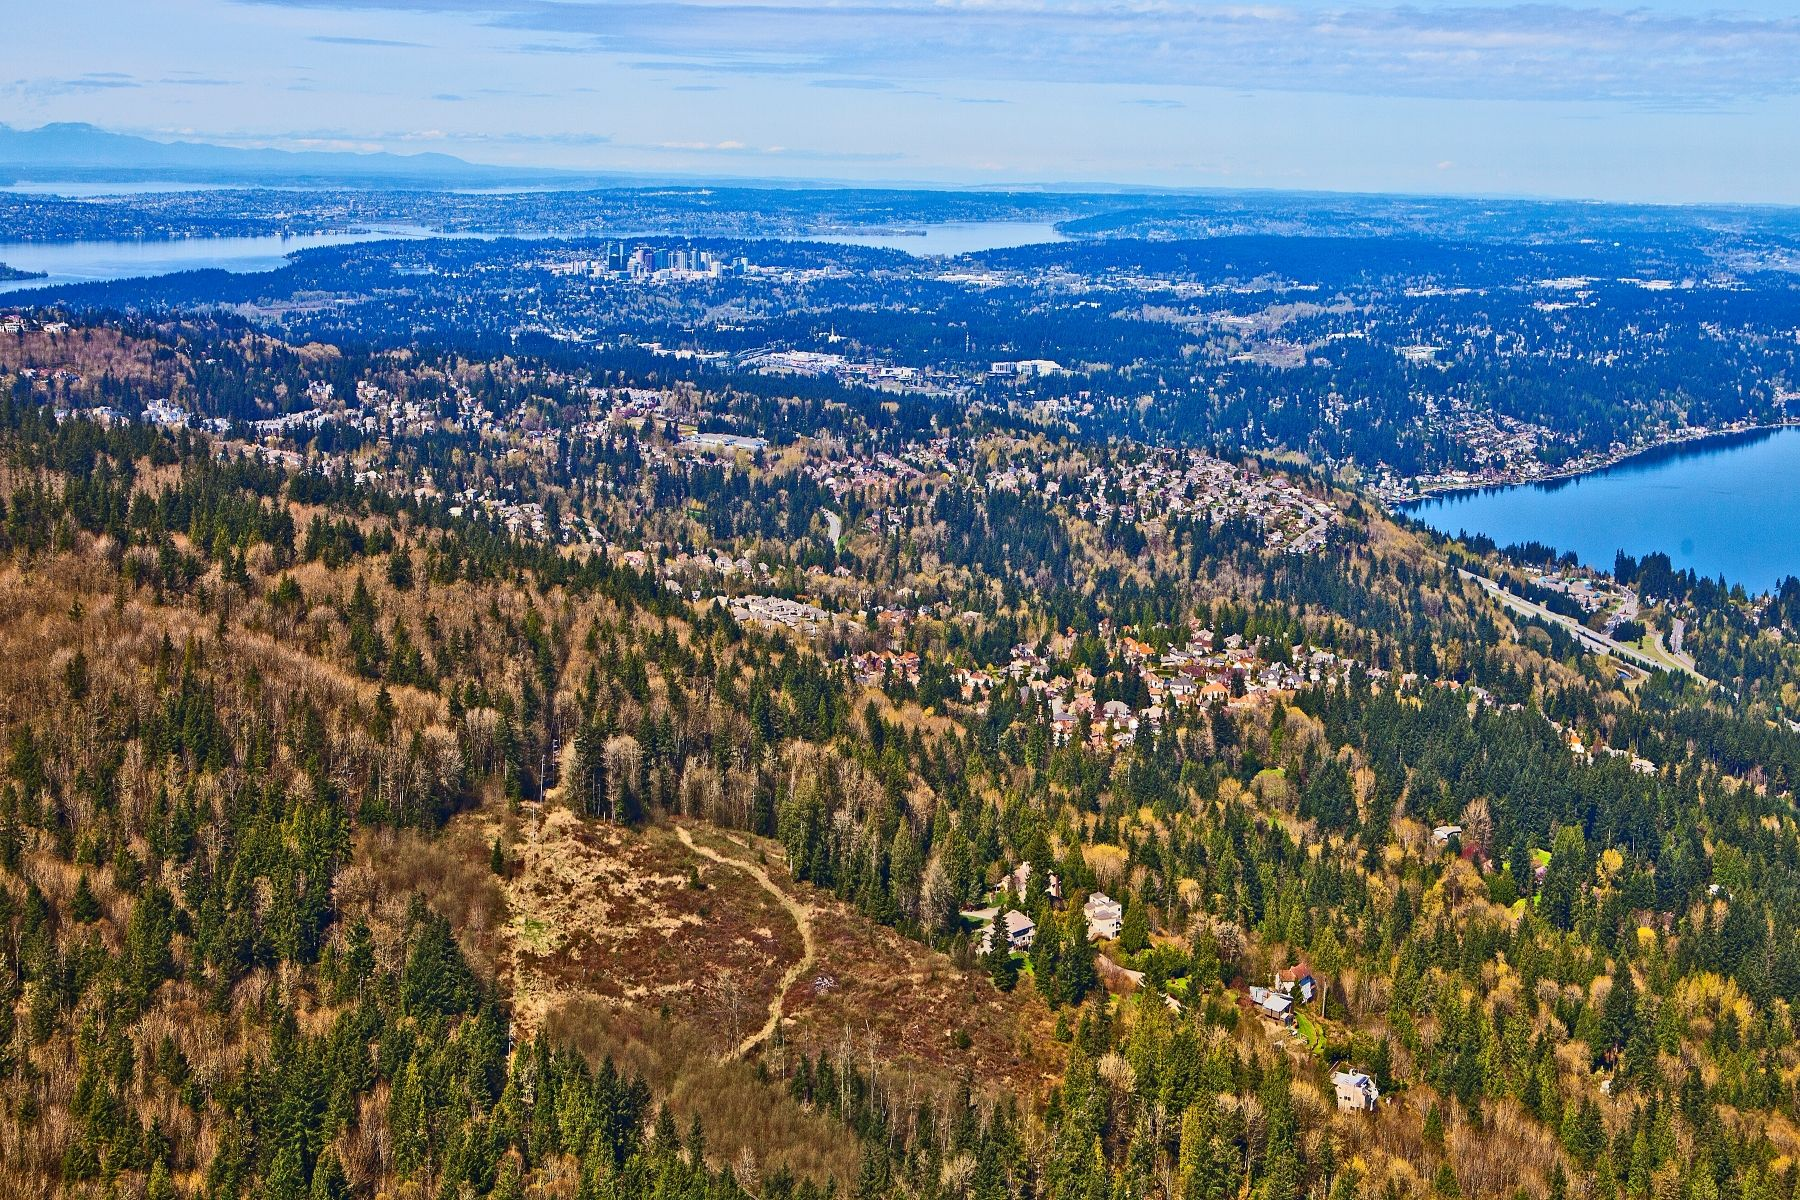 Land for Sale at 18500 SE 65th Place, Issaquah, WA 98027 Issaquah, Washington 98027 United States